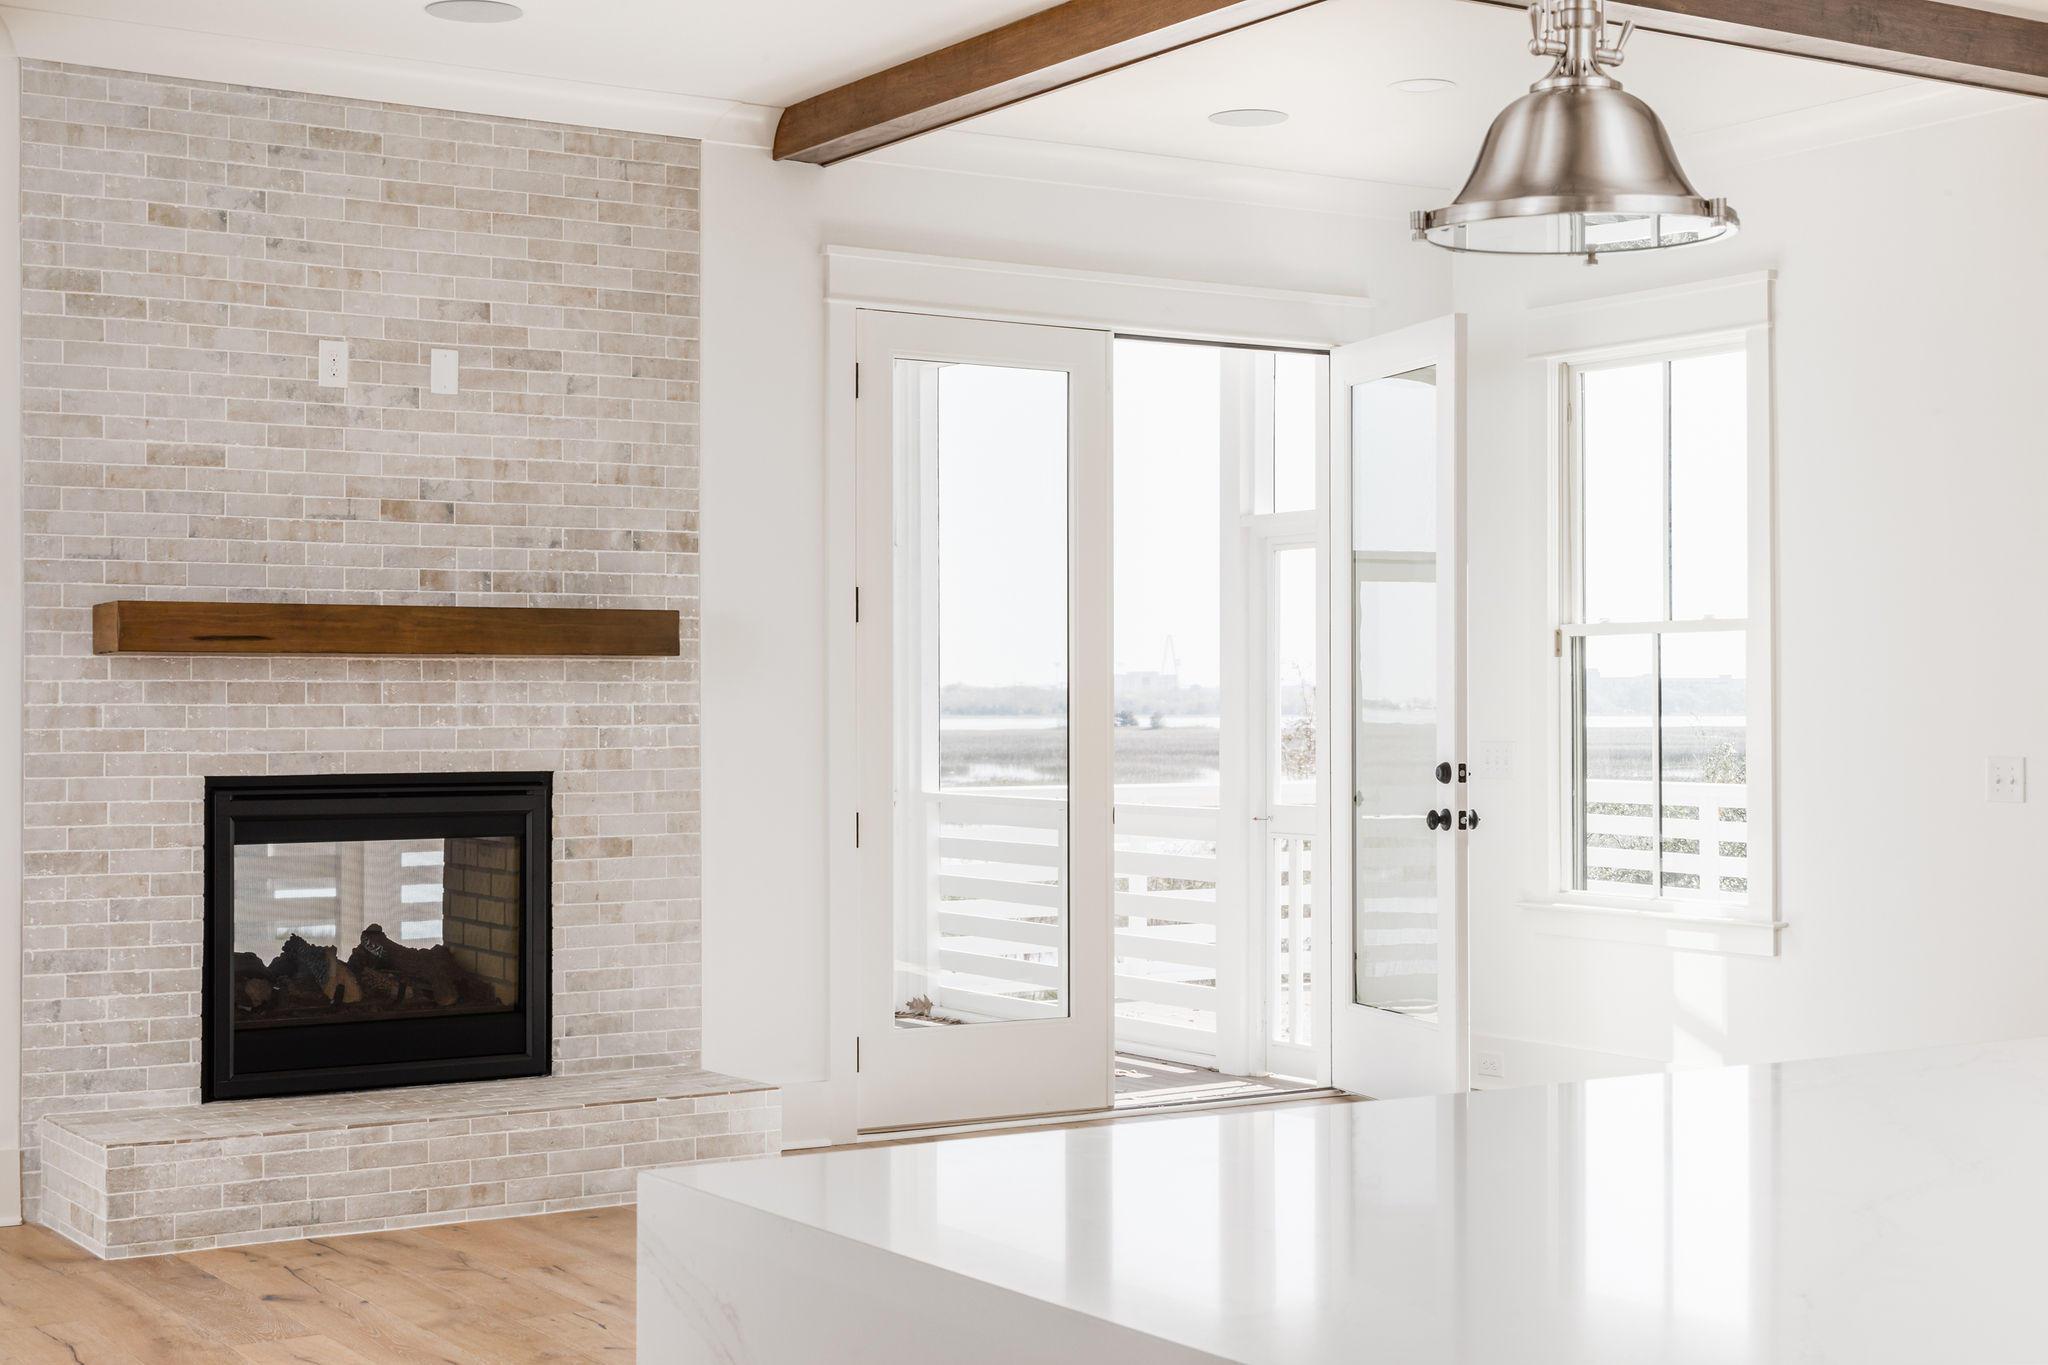 Park West Homes For Sale - 2292 Middlesex, Mount Pleasant, SC - 18